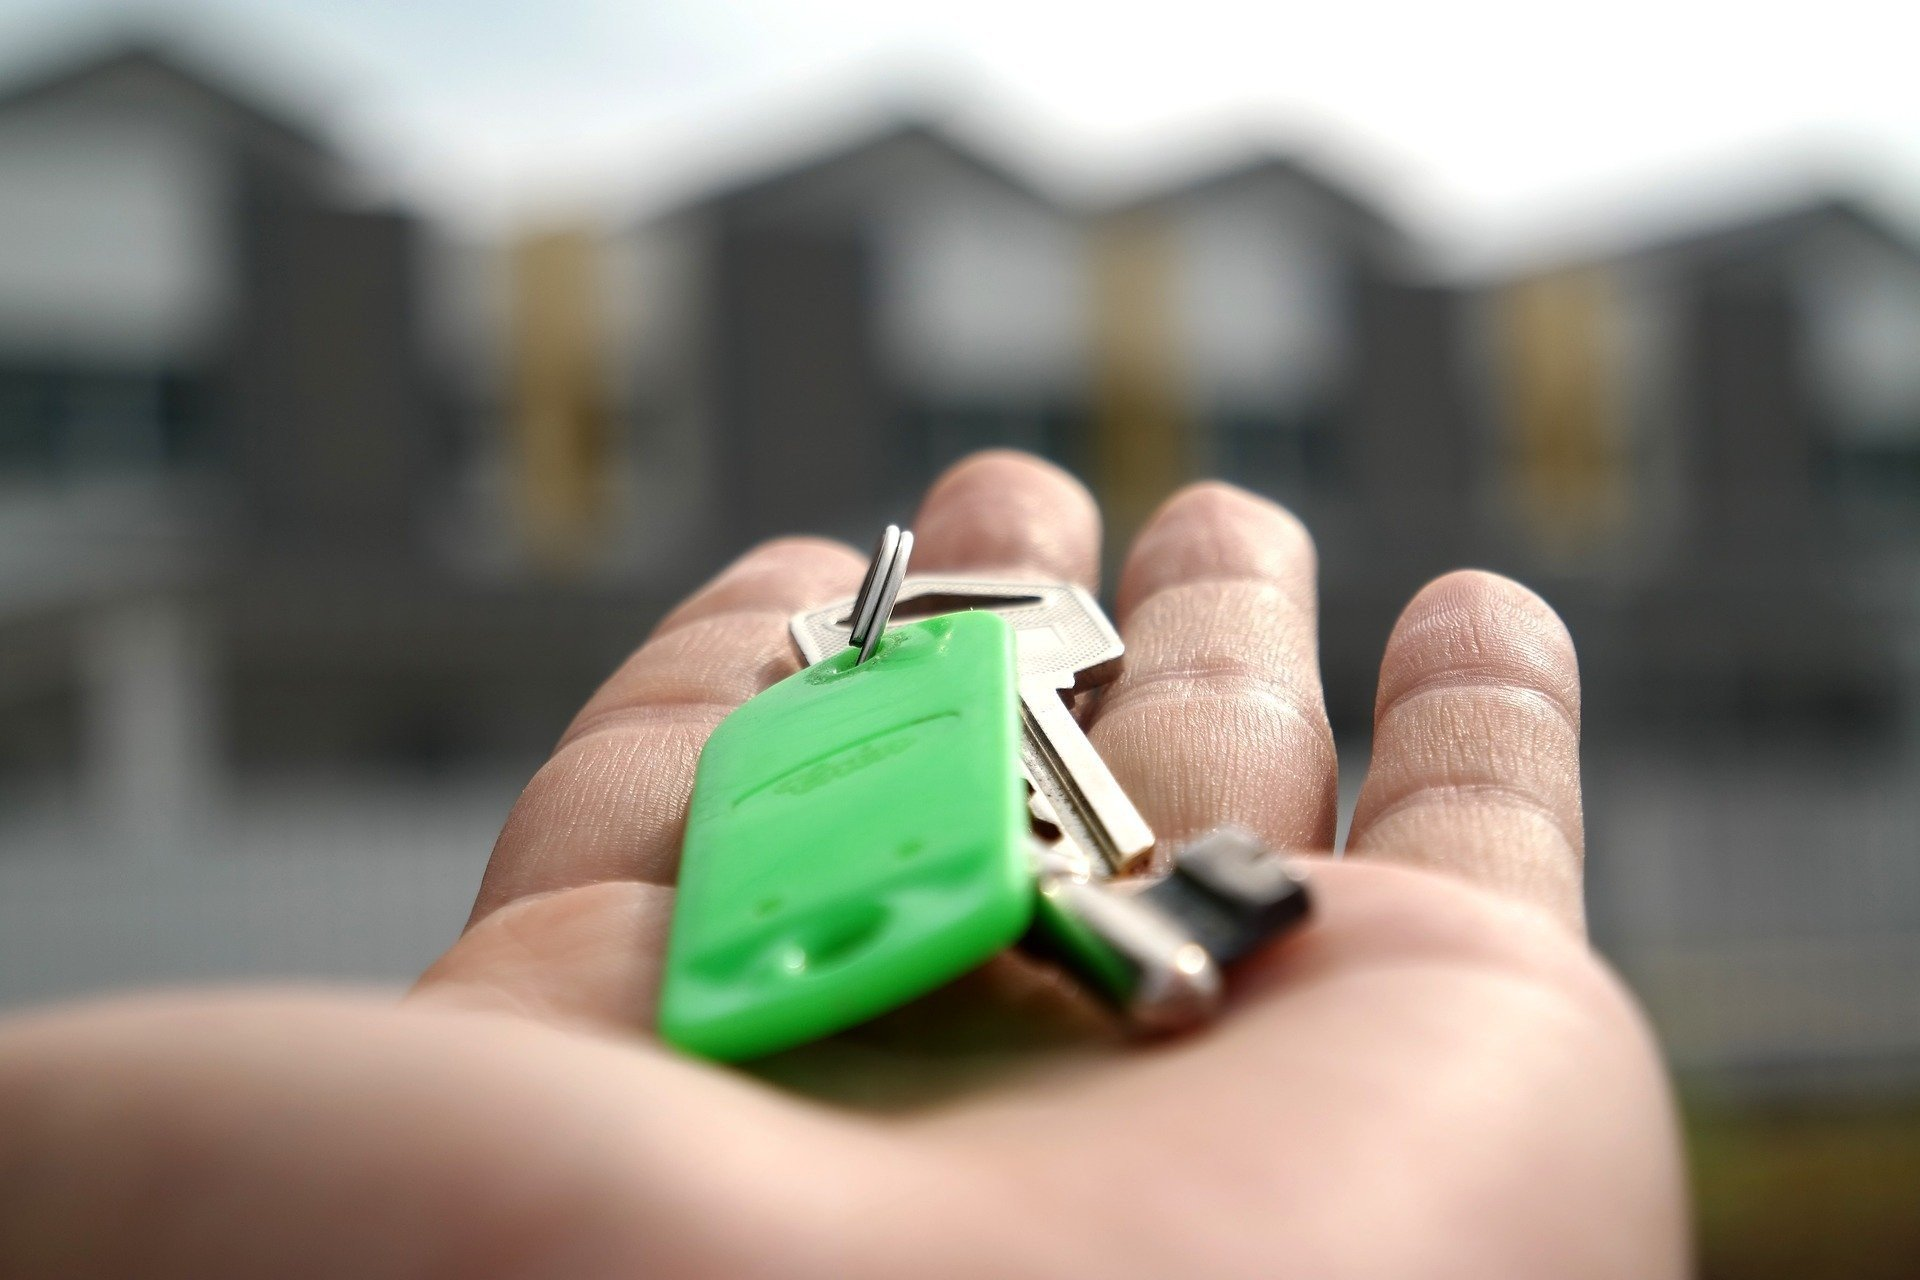 Задержка в сдаче дома: как отвечает застройщик